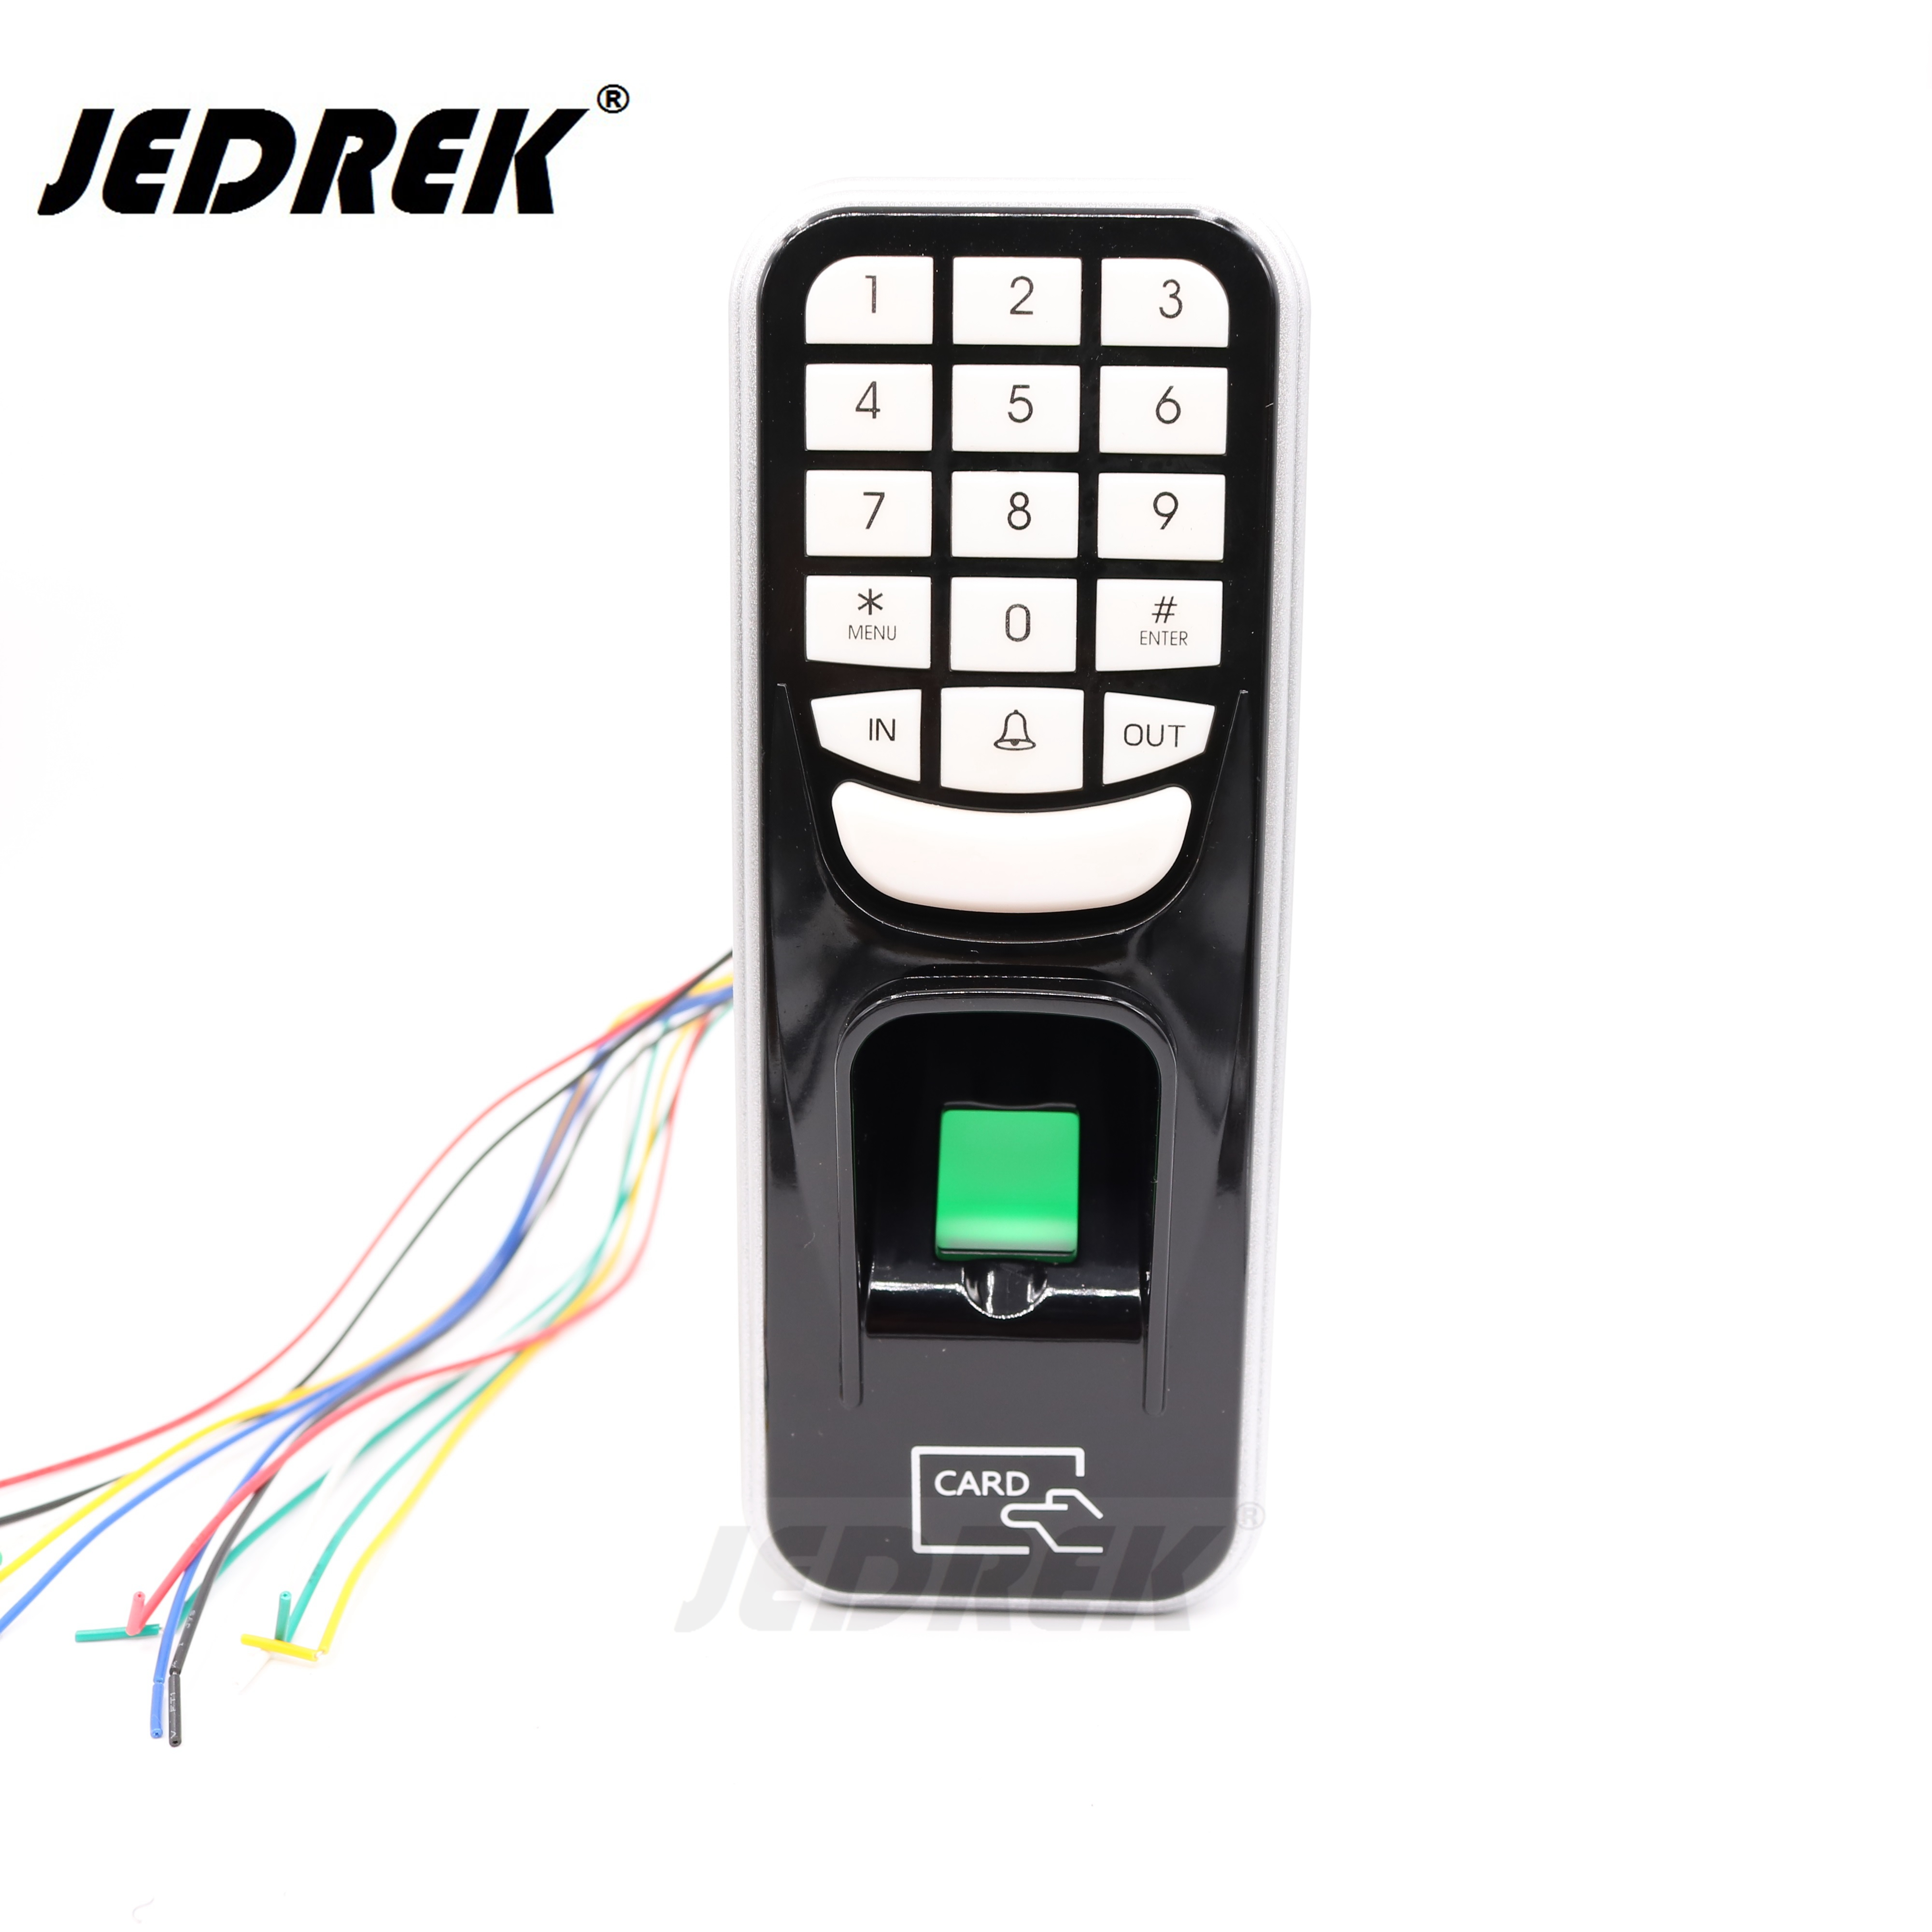 Bio Fingerprinter RFID 125khz EM Card standalone keypad with U disk export interface for door access control+power supply 10 rfid card 125khz em keypad card access control system kit power supply door swtich button